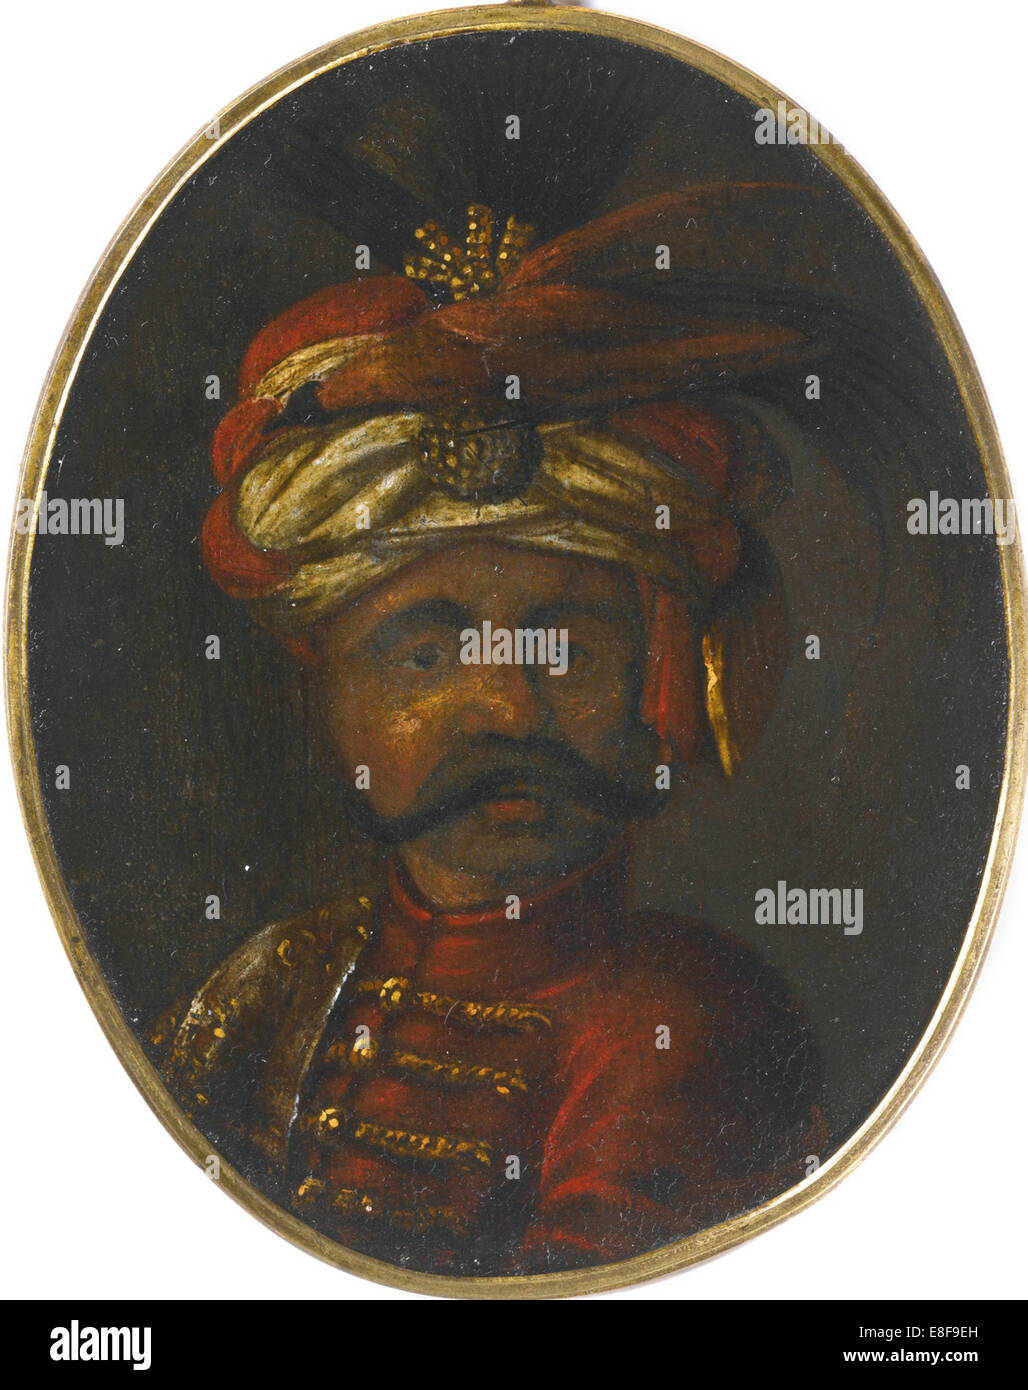 Suleiman II (1642-1691), Sultan of the Ottoman Empire. Artist: Anonymous - Stock Image